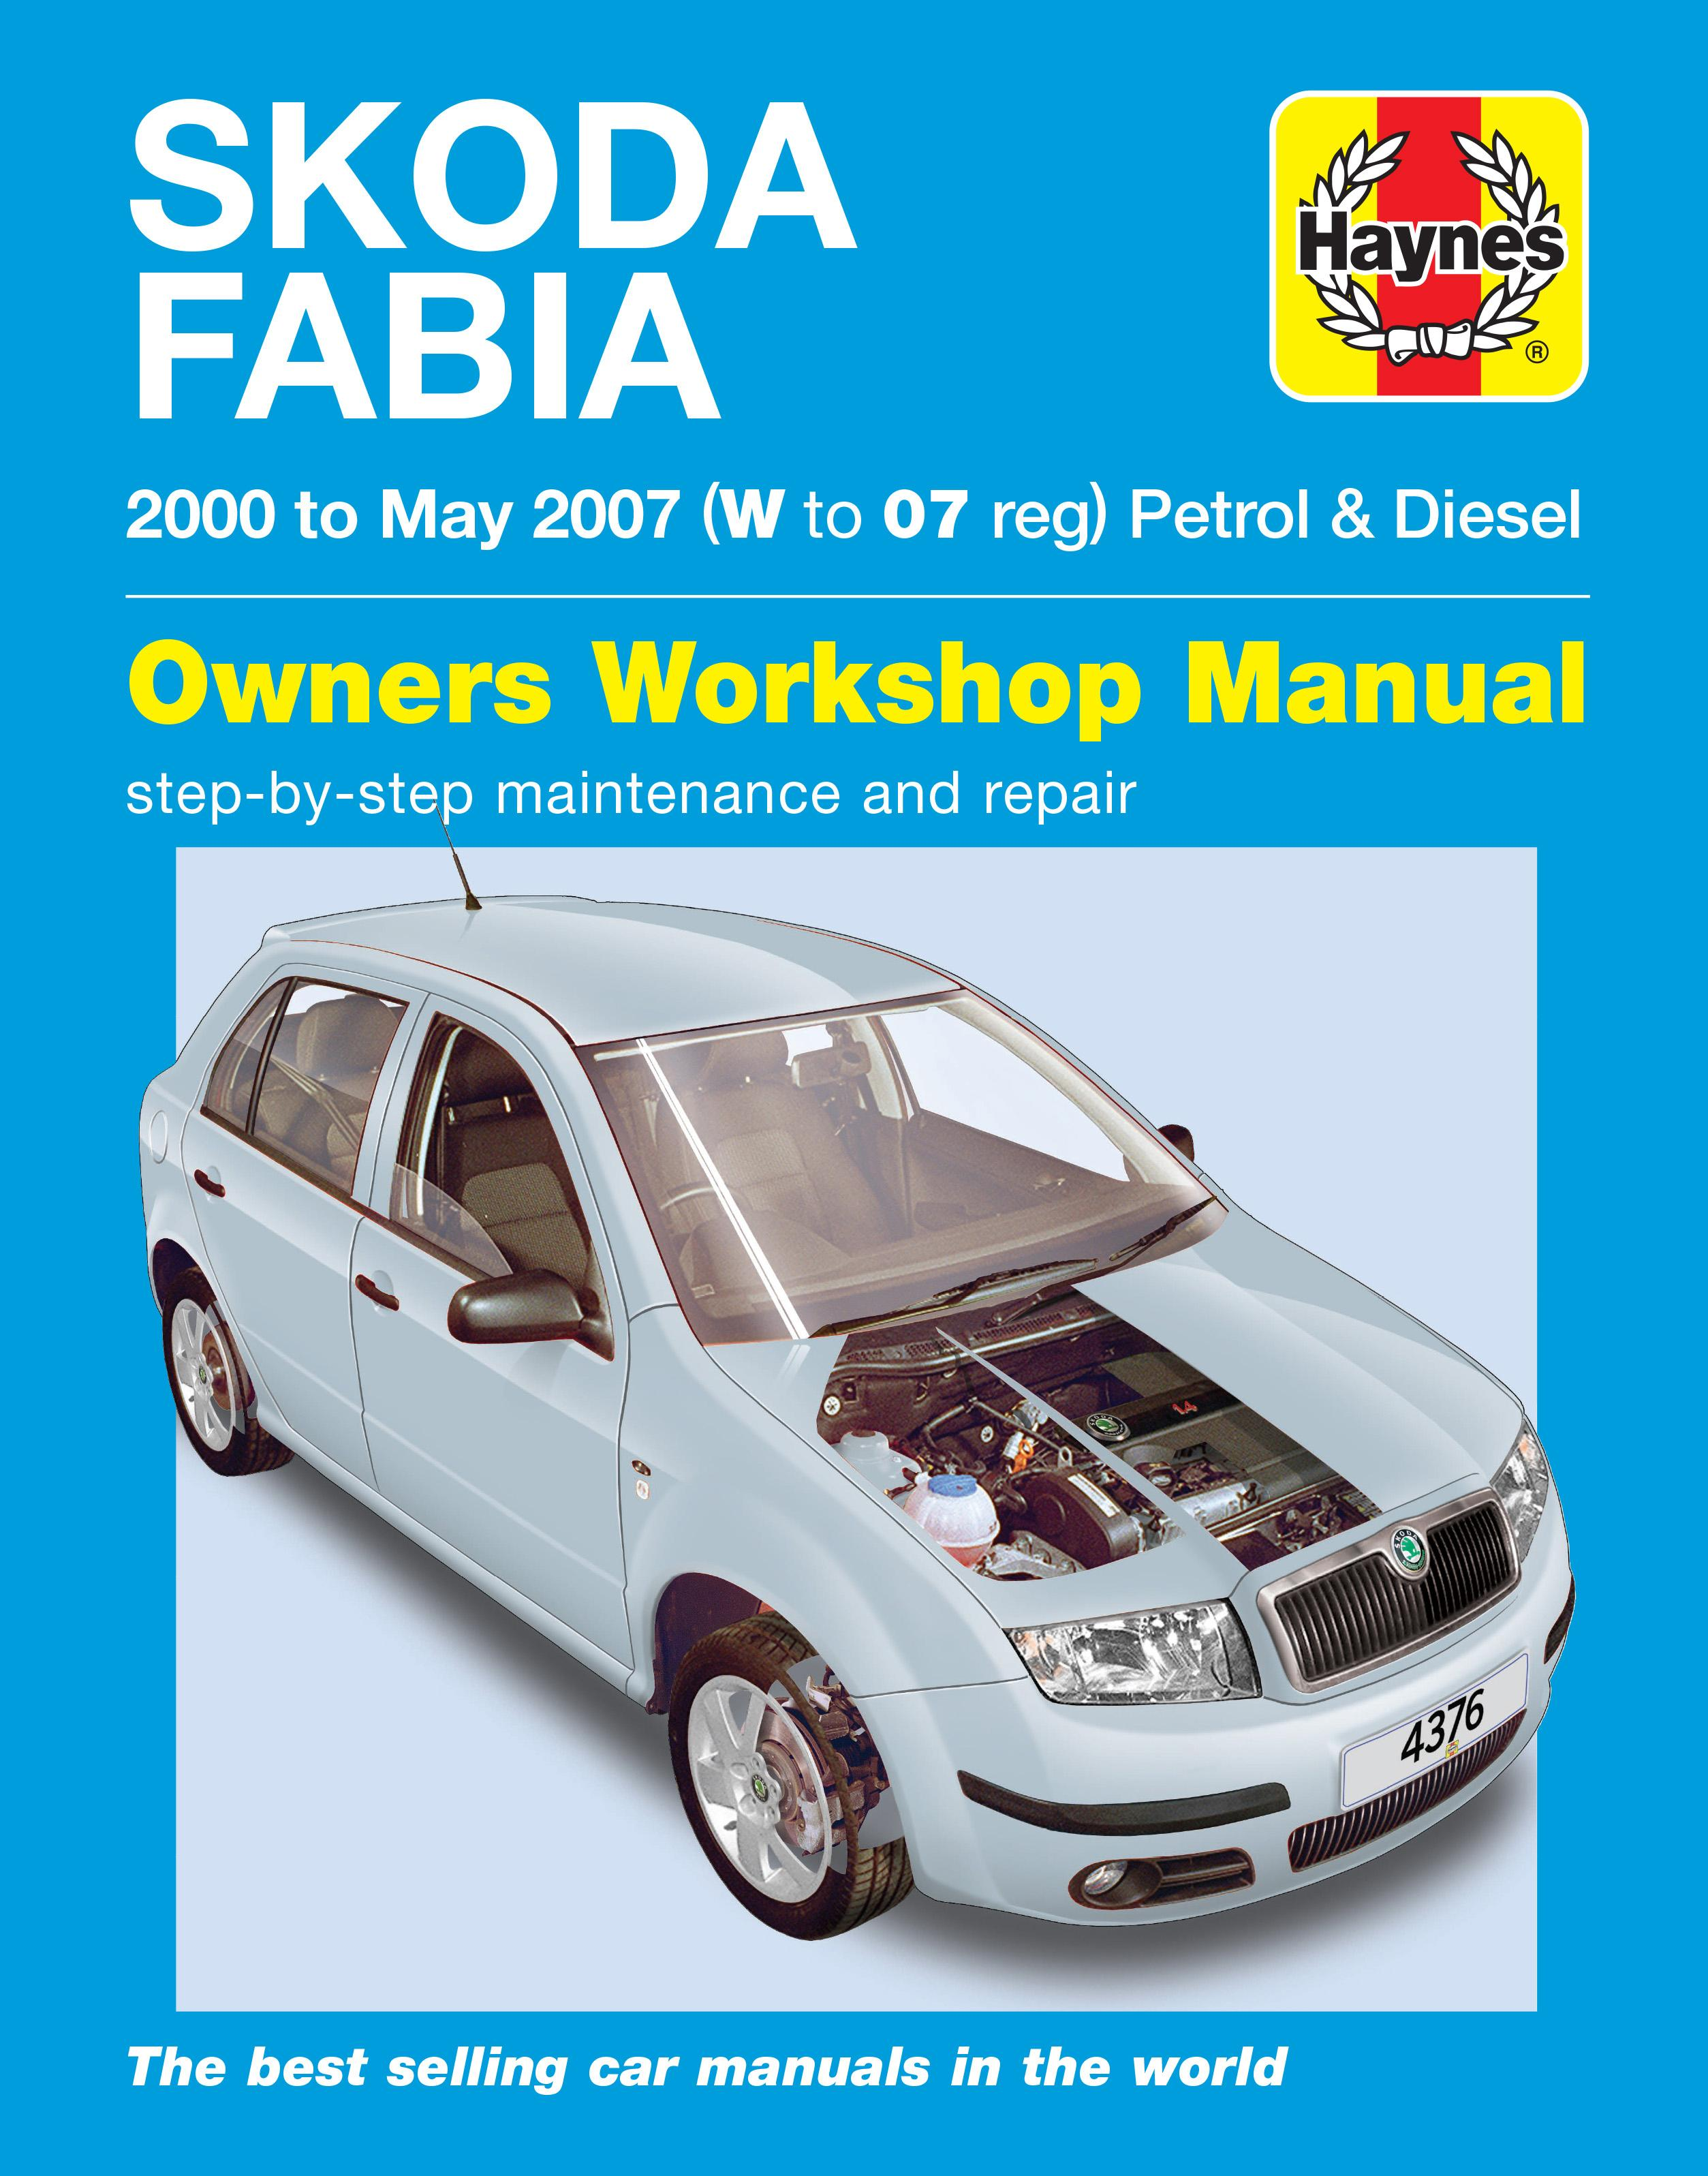 Skoda Felicia Wiring Diagram Engine Library Fuse Box Haynes Fabia 00 06 Manual Rh Halfords Com